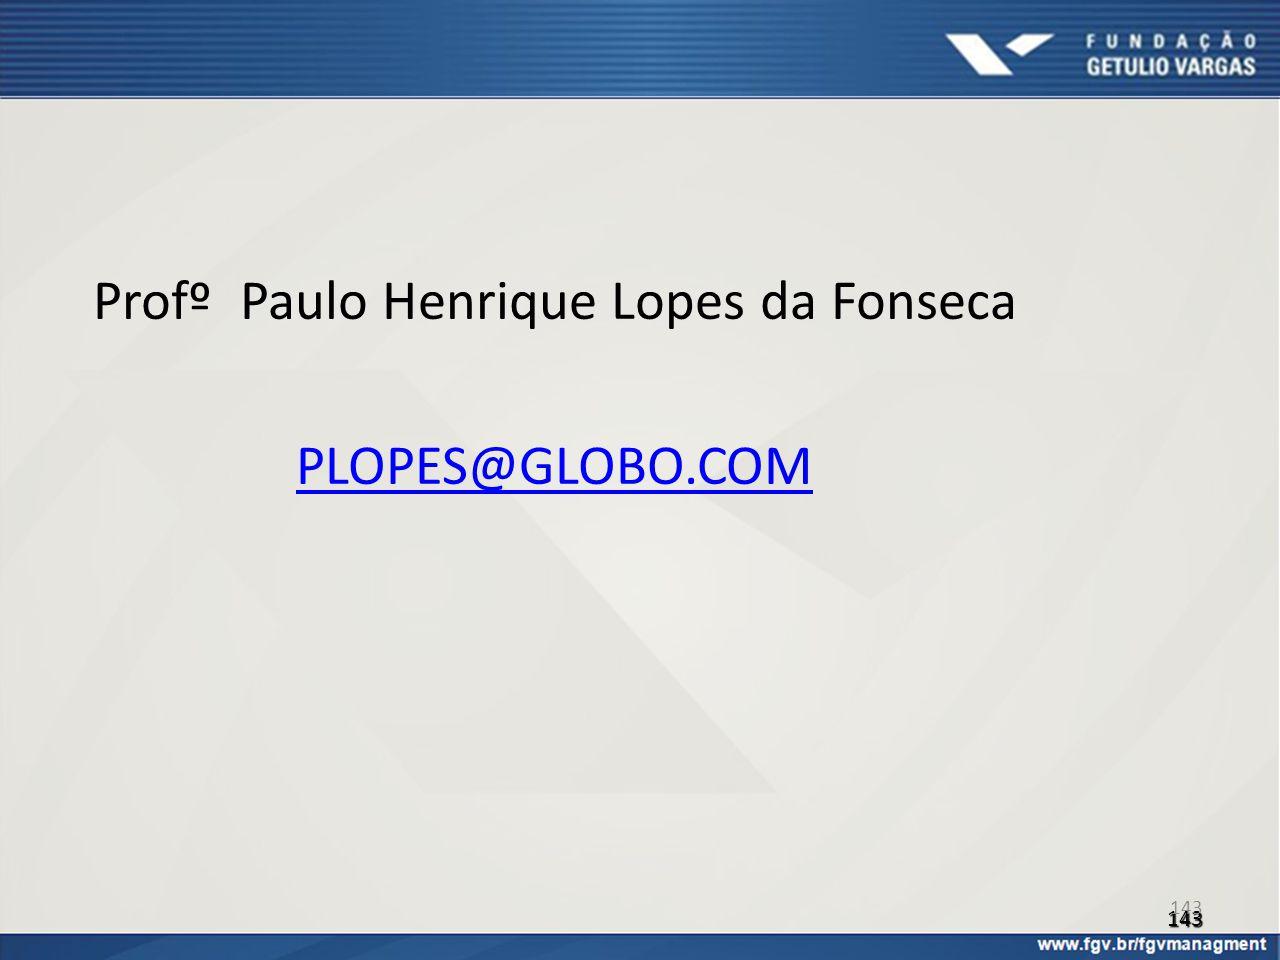 143 Profº Paulo Henrique Lopes da Fonseca PLOPES@GLOBO.COM 143